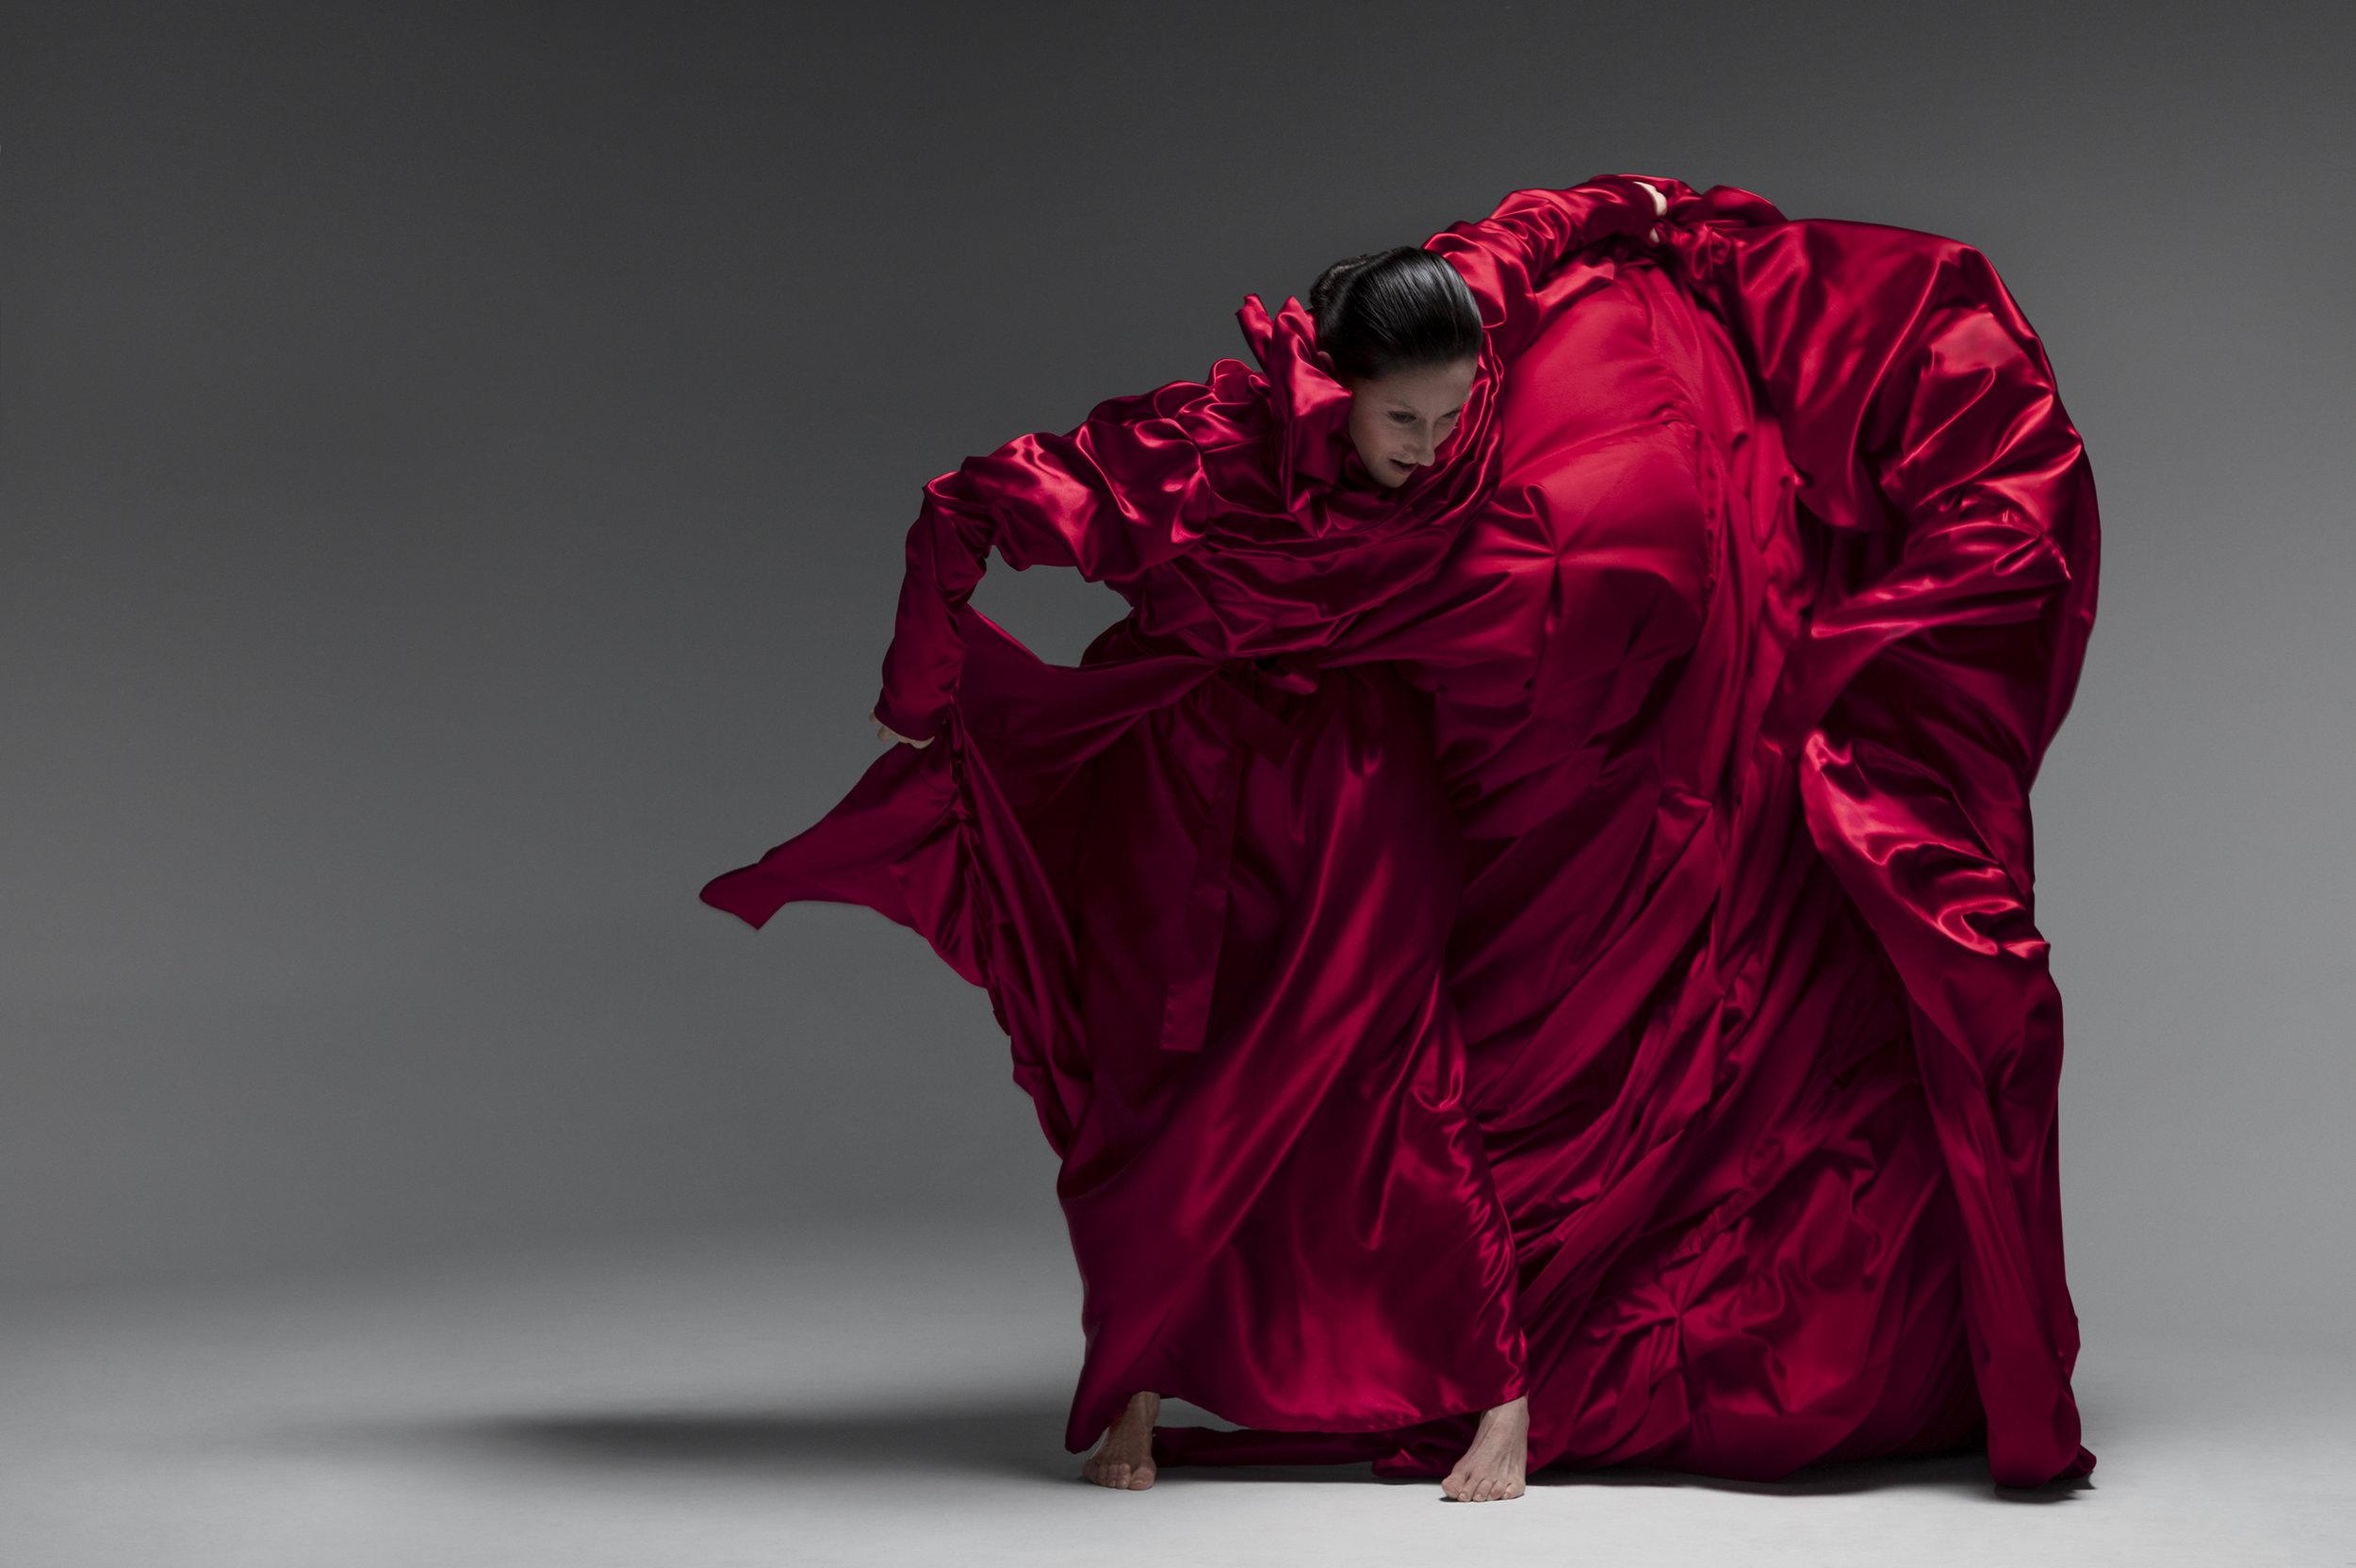 Vangeline wearing the replica of Tatsumi Hijikata's costume by Todd Thomas. Photo by Matthew Placek.